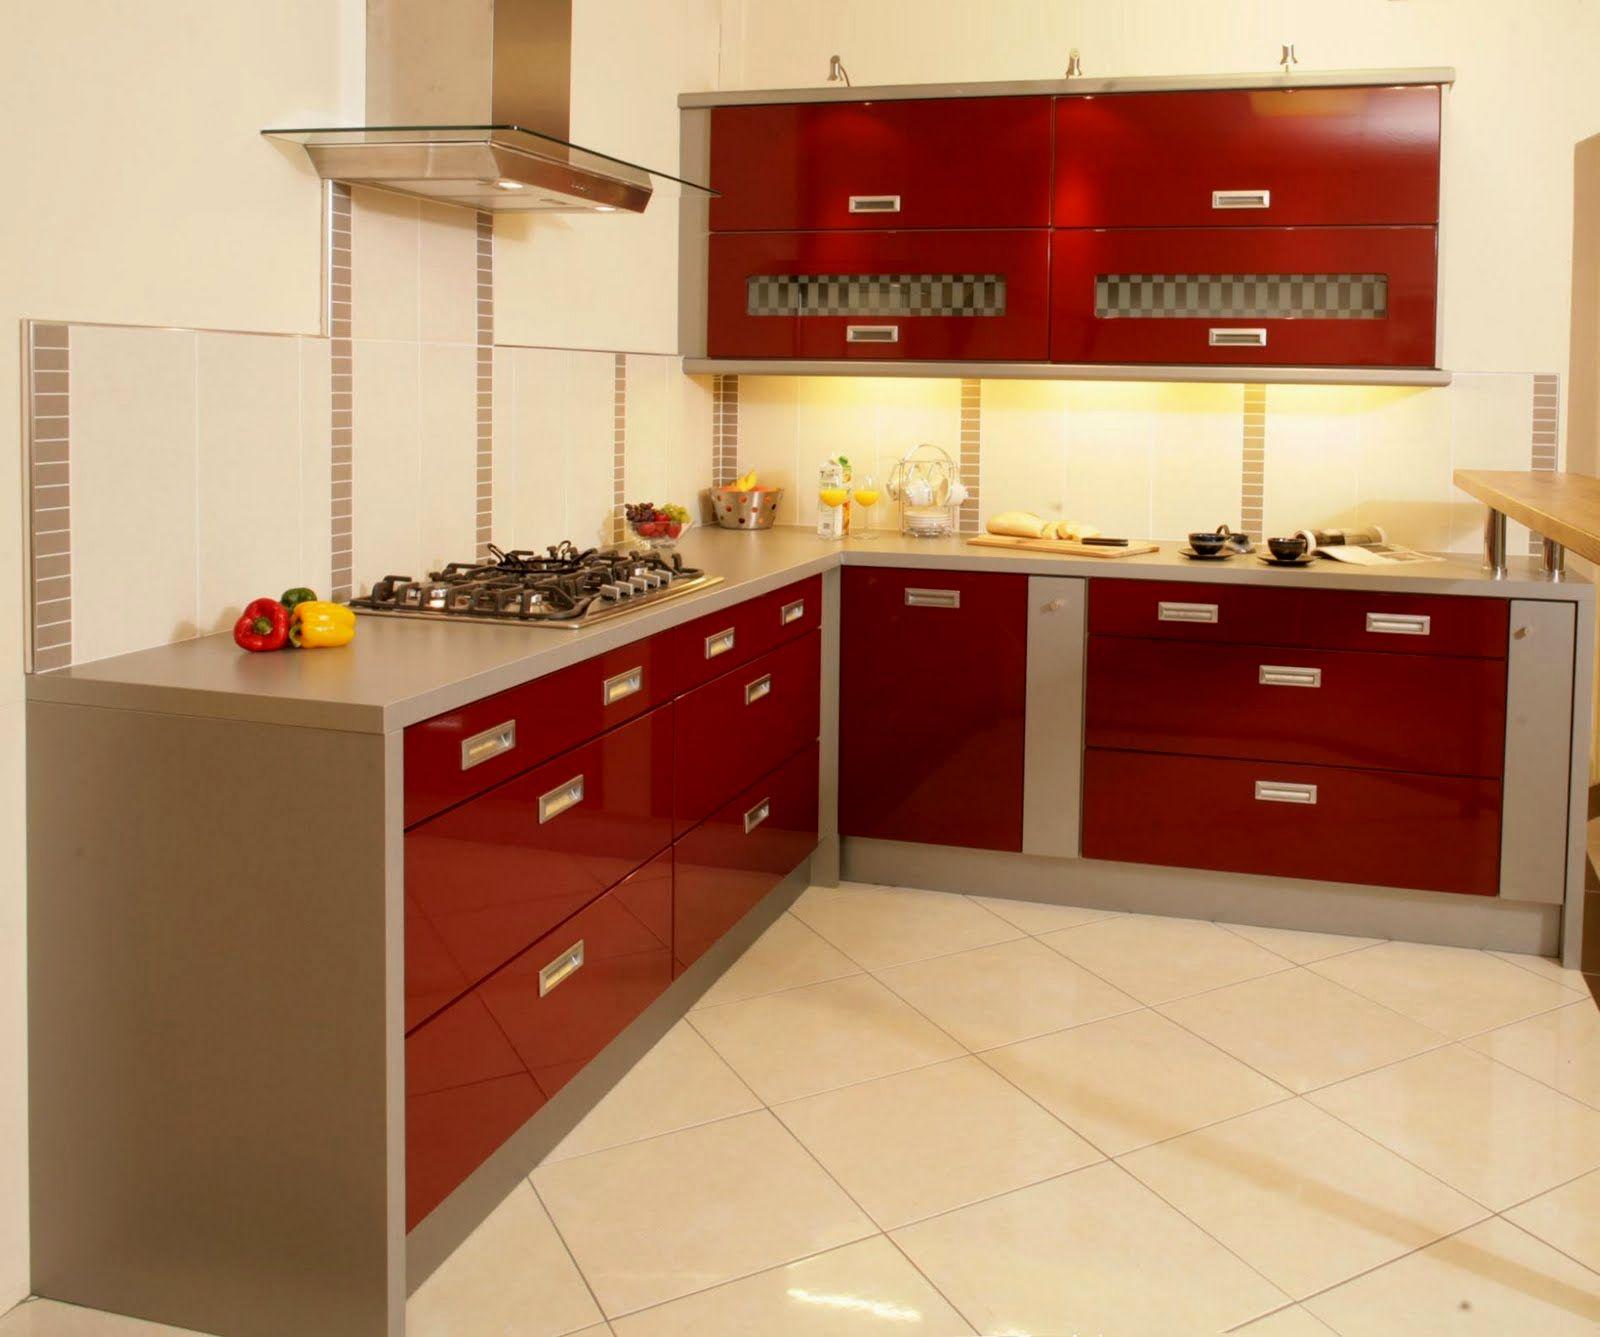 luxury bathroom wall storage cabinets model-Latest Bathroom Wall Storage Cabinets Décor